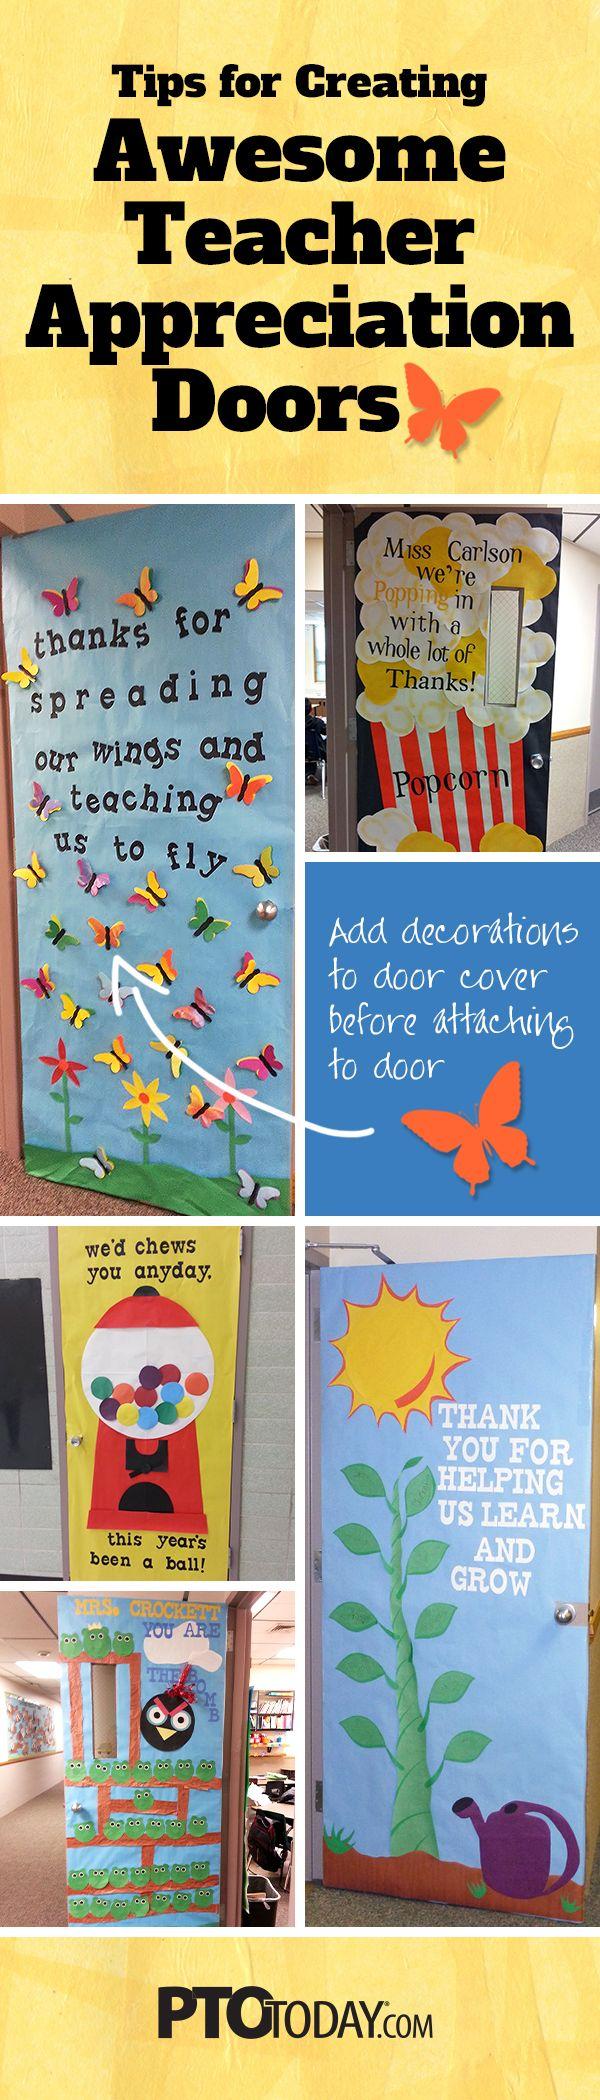 Teacher appreciation door decorating ideasutips for pto and pta